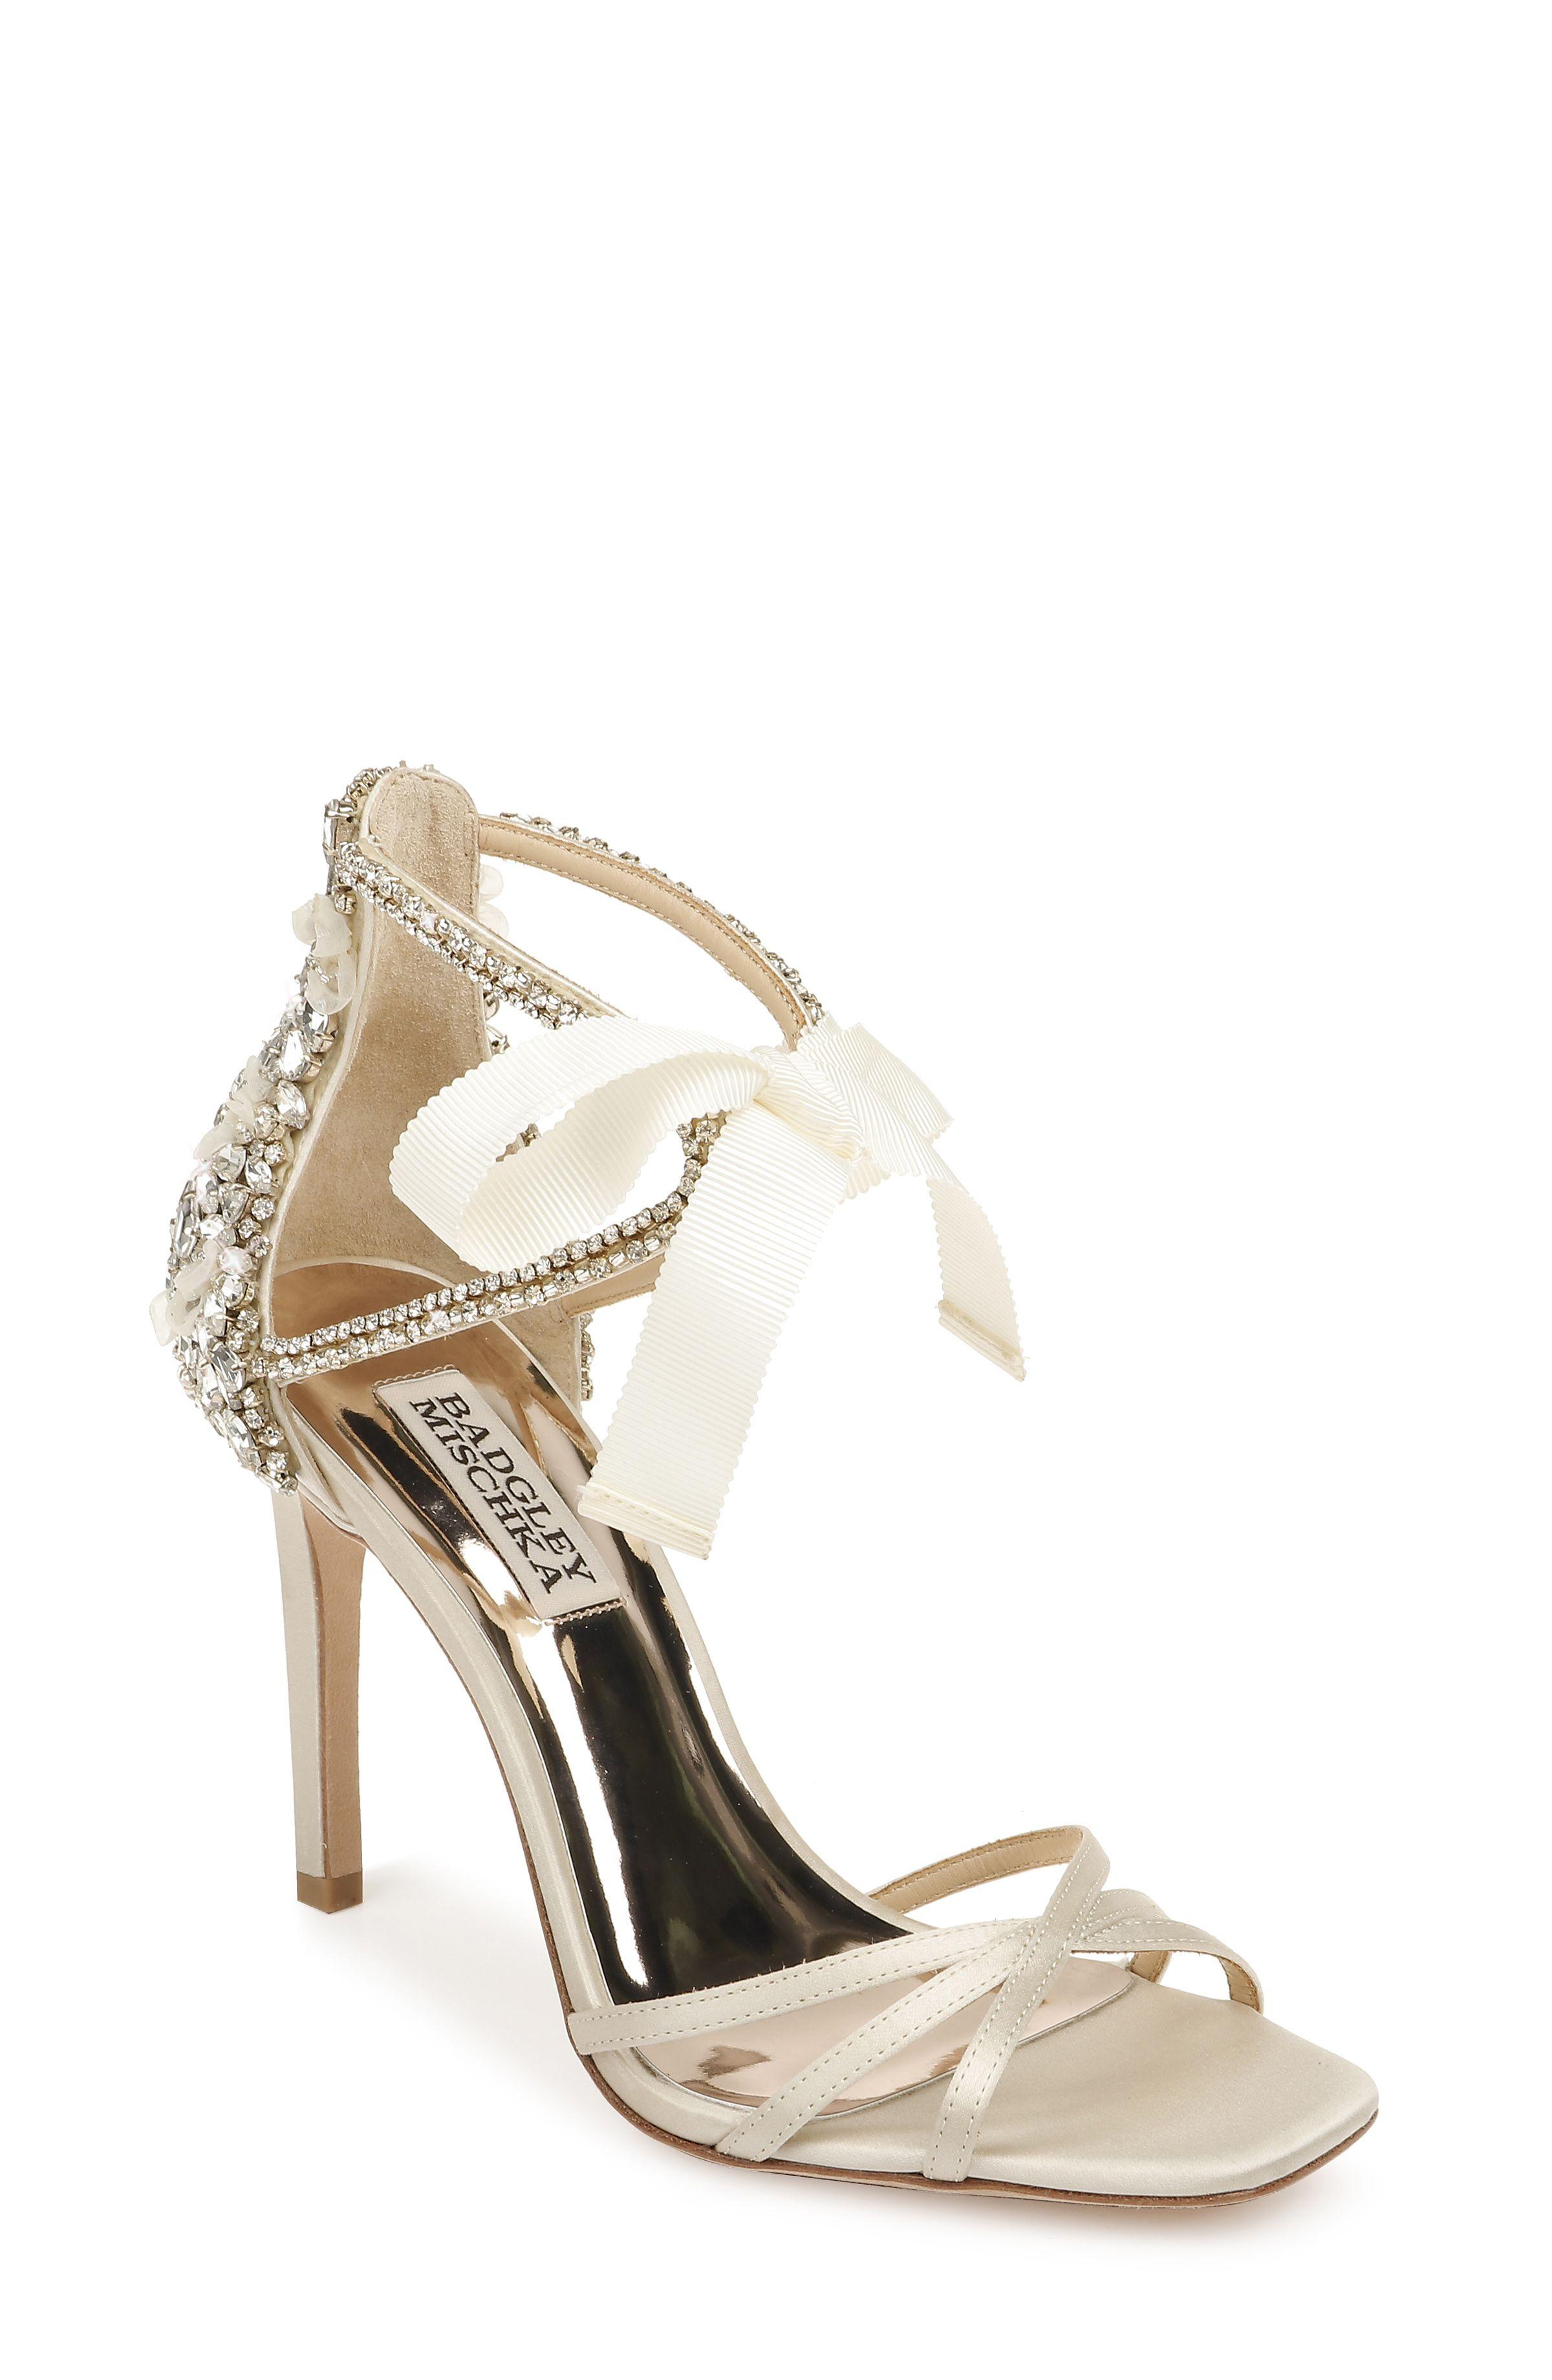 Joanie Crystal Embellished Evening Shoe